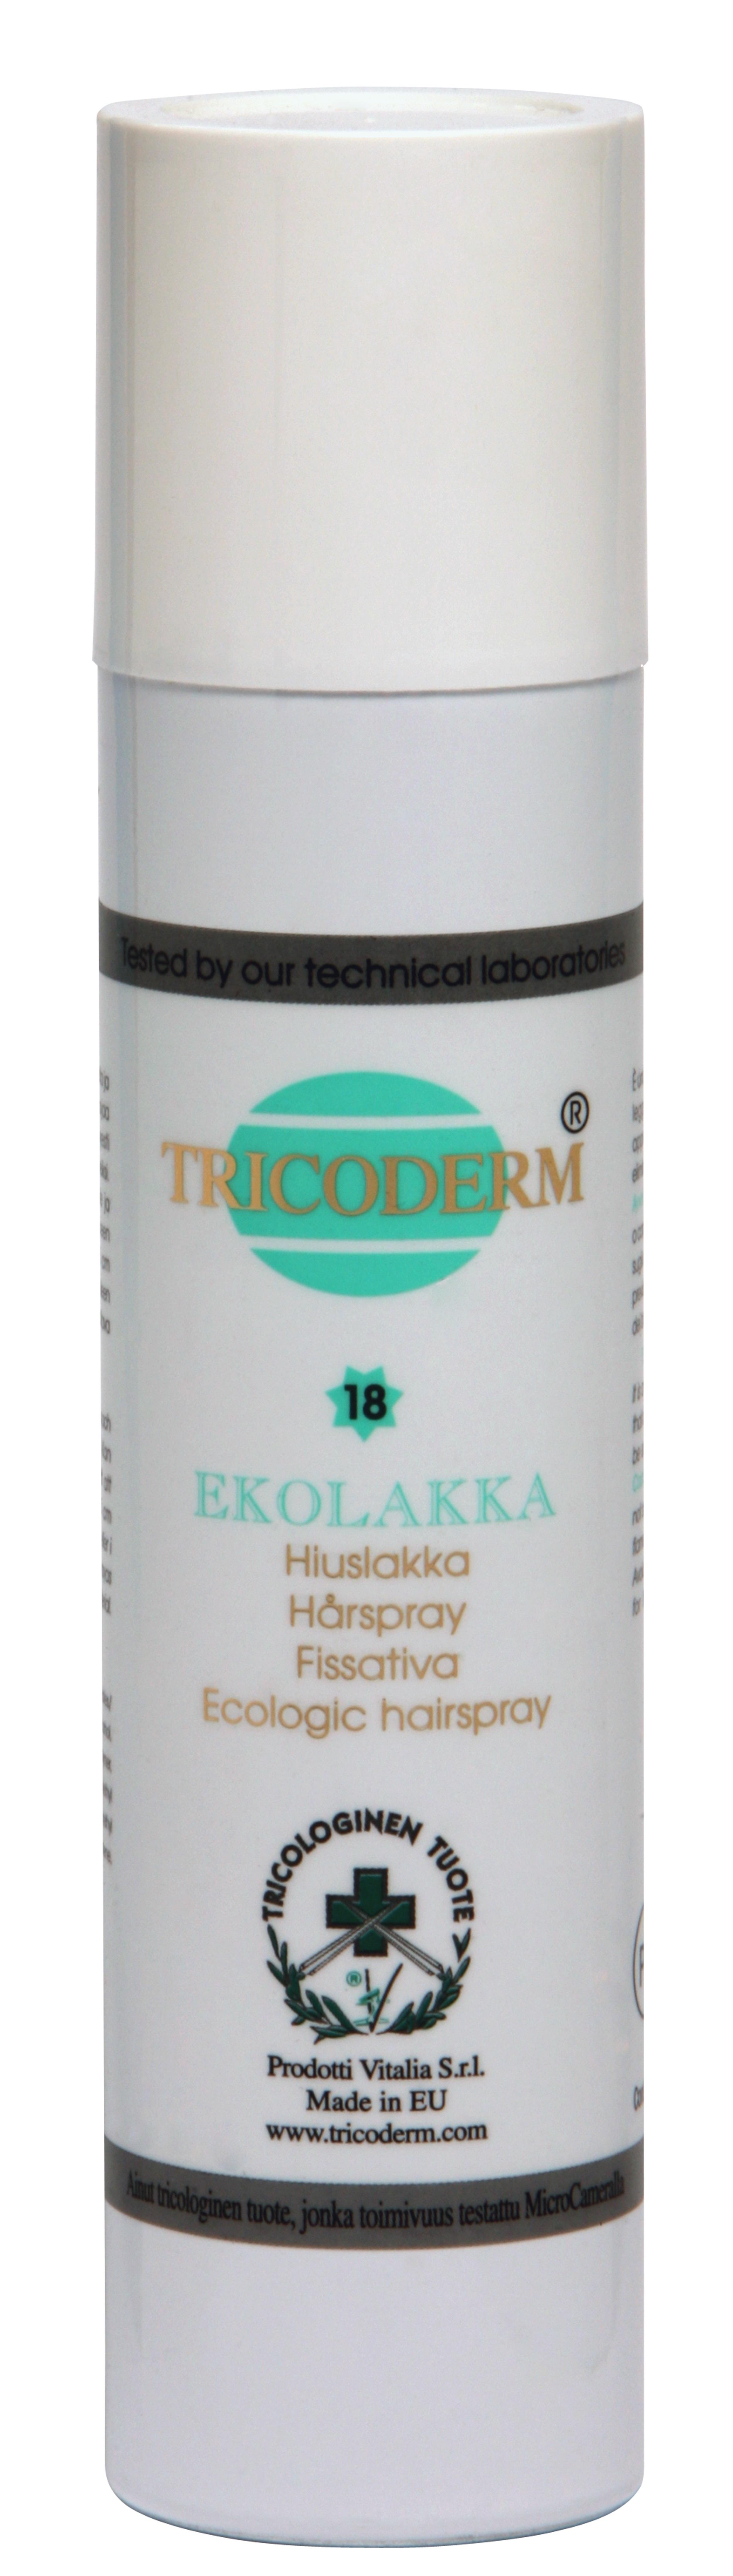 Ecolakka